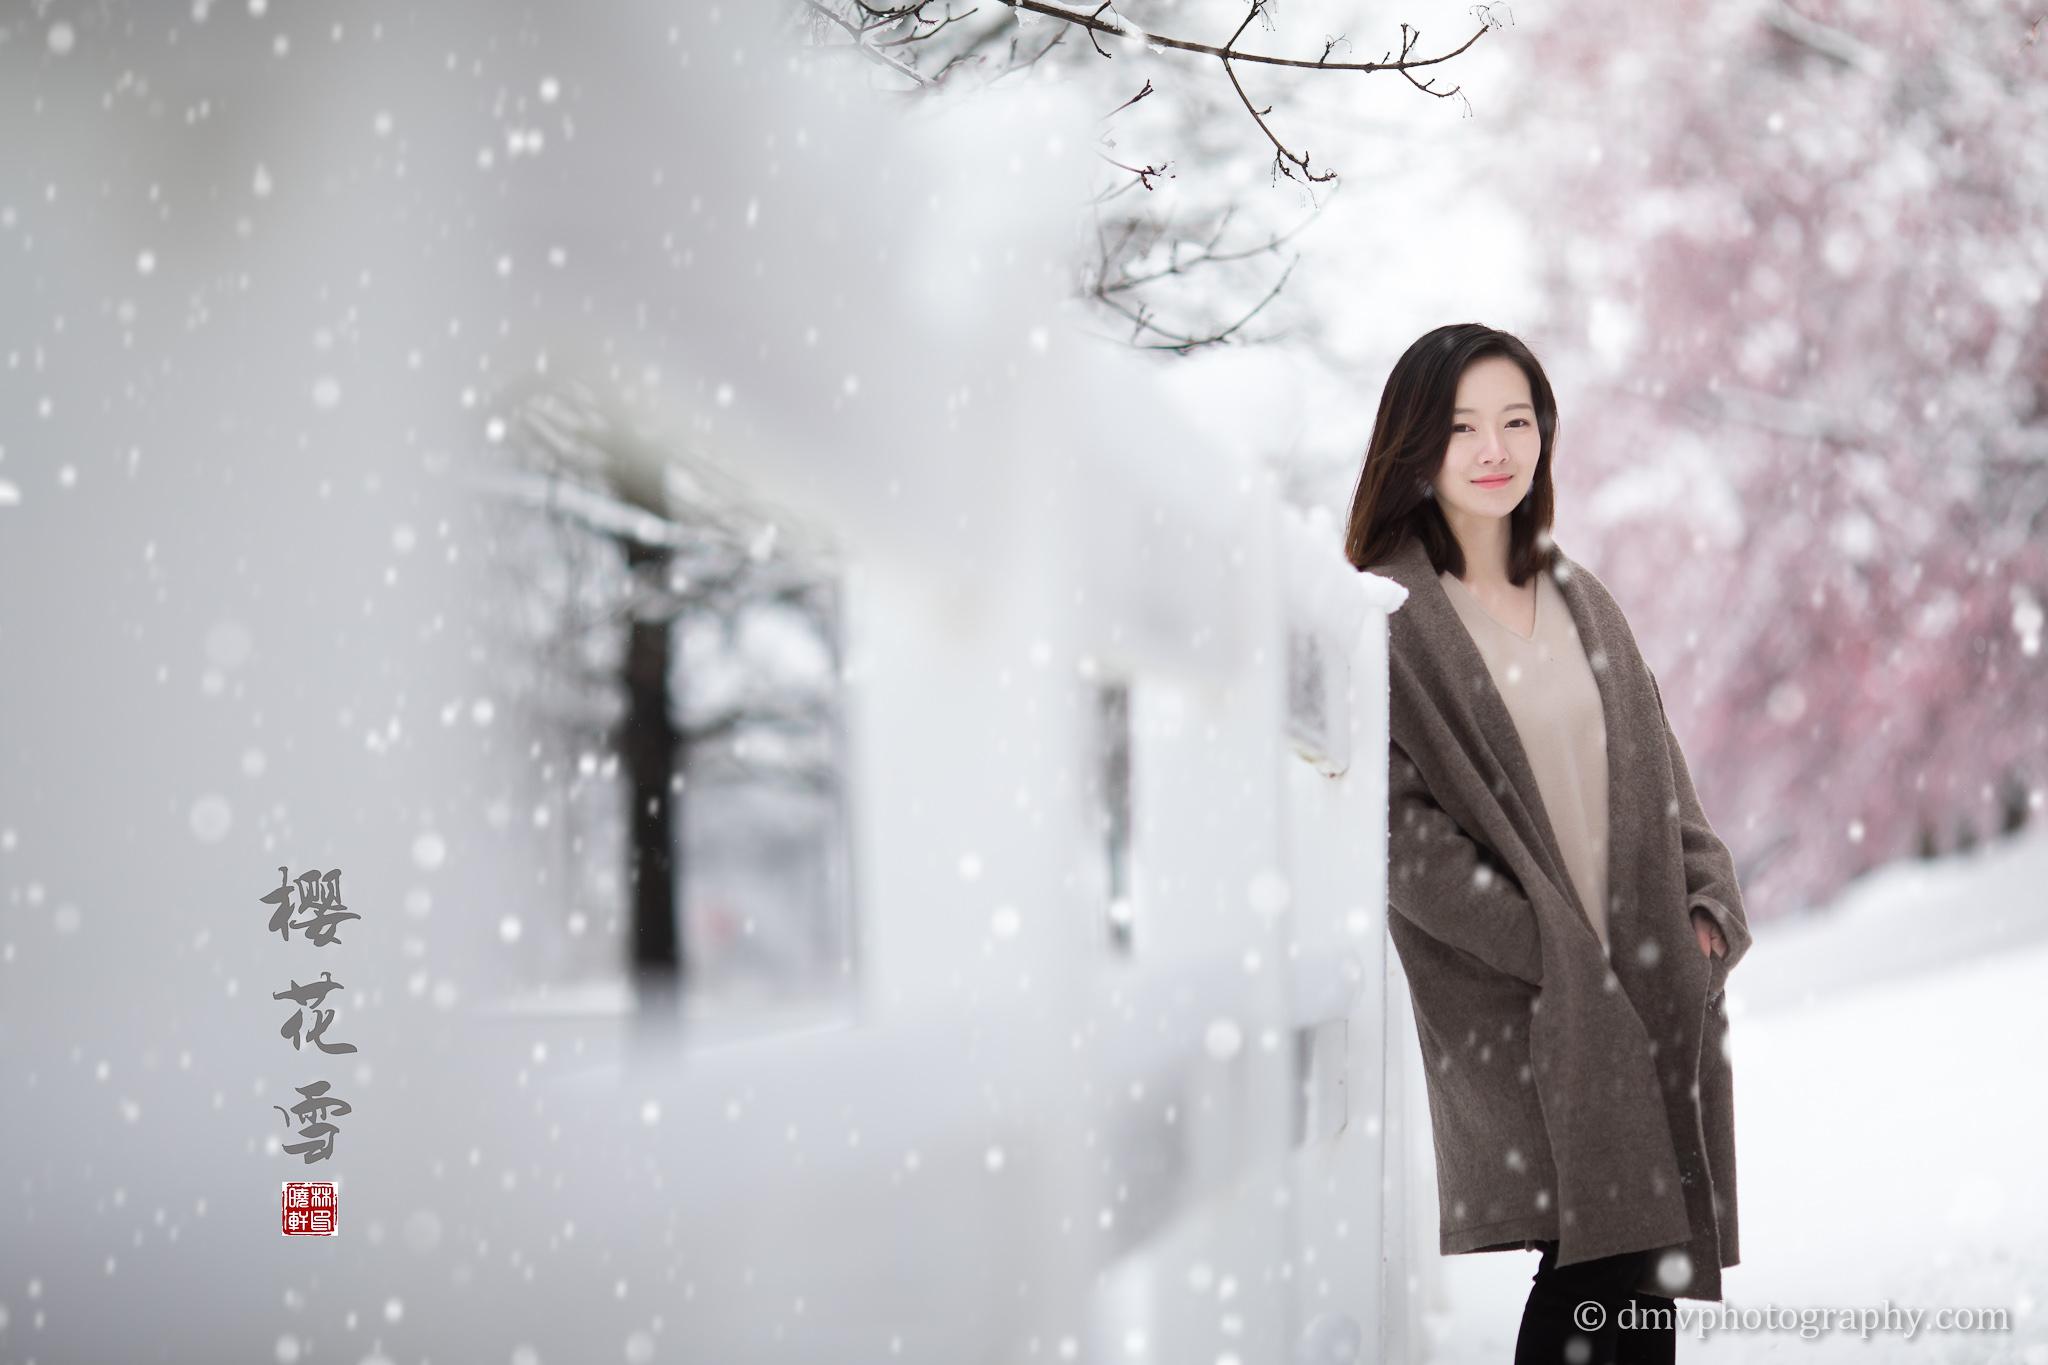 _D4_8504-snow